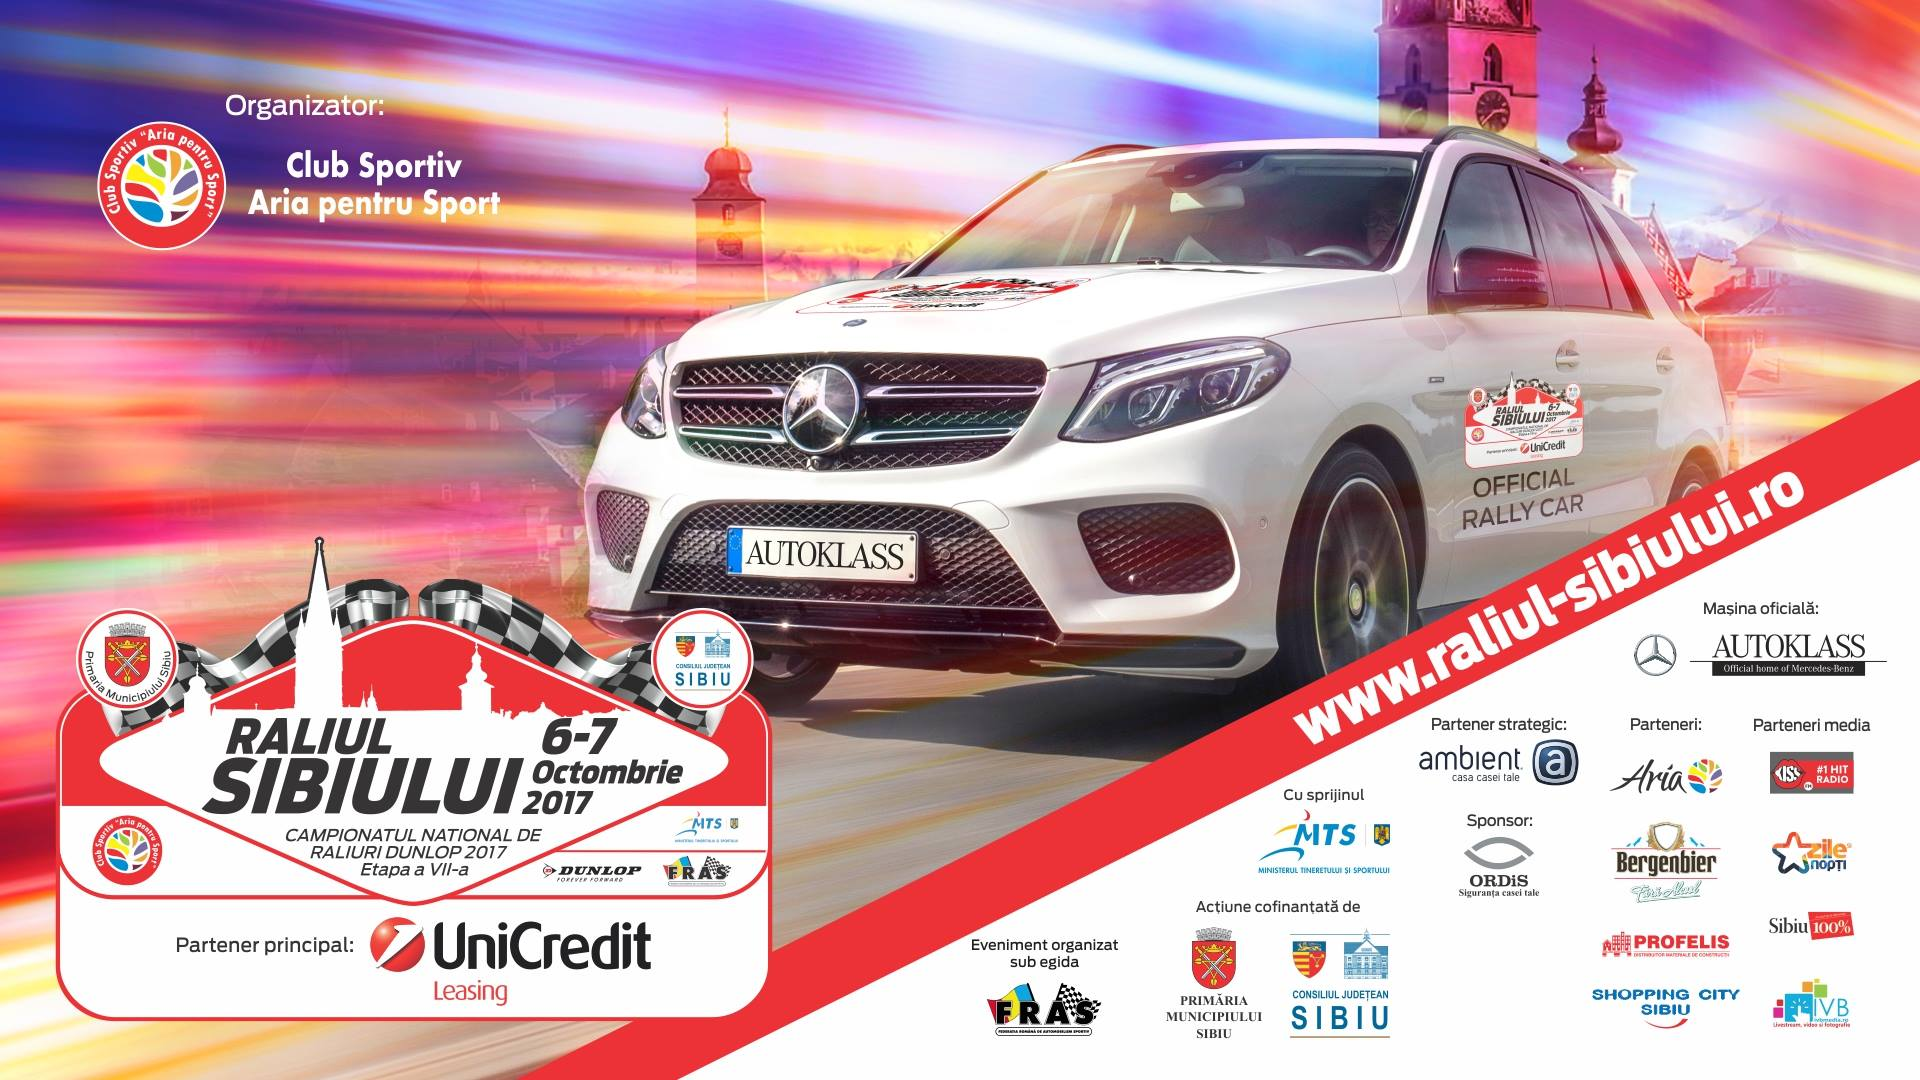 Raliul Sibiului UniCredit Leasing 2017